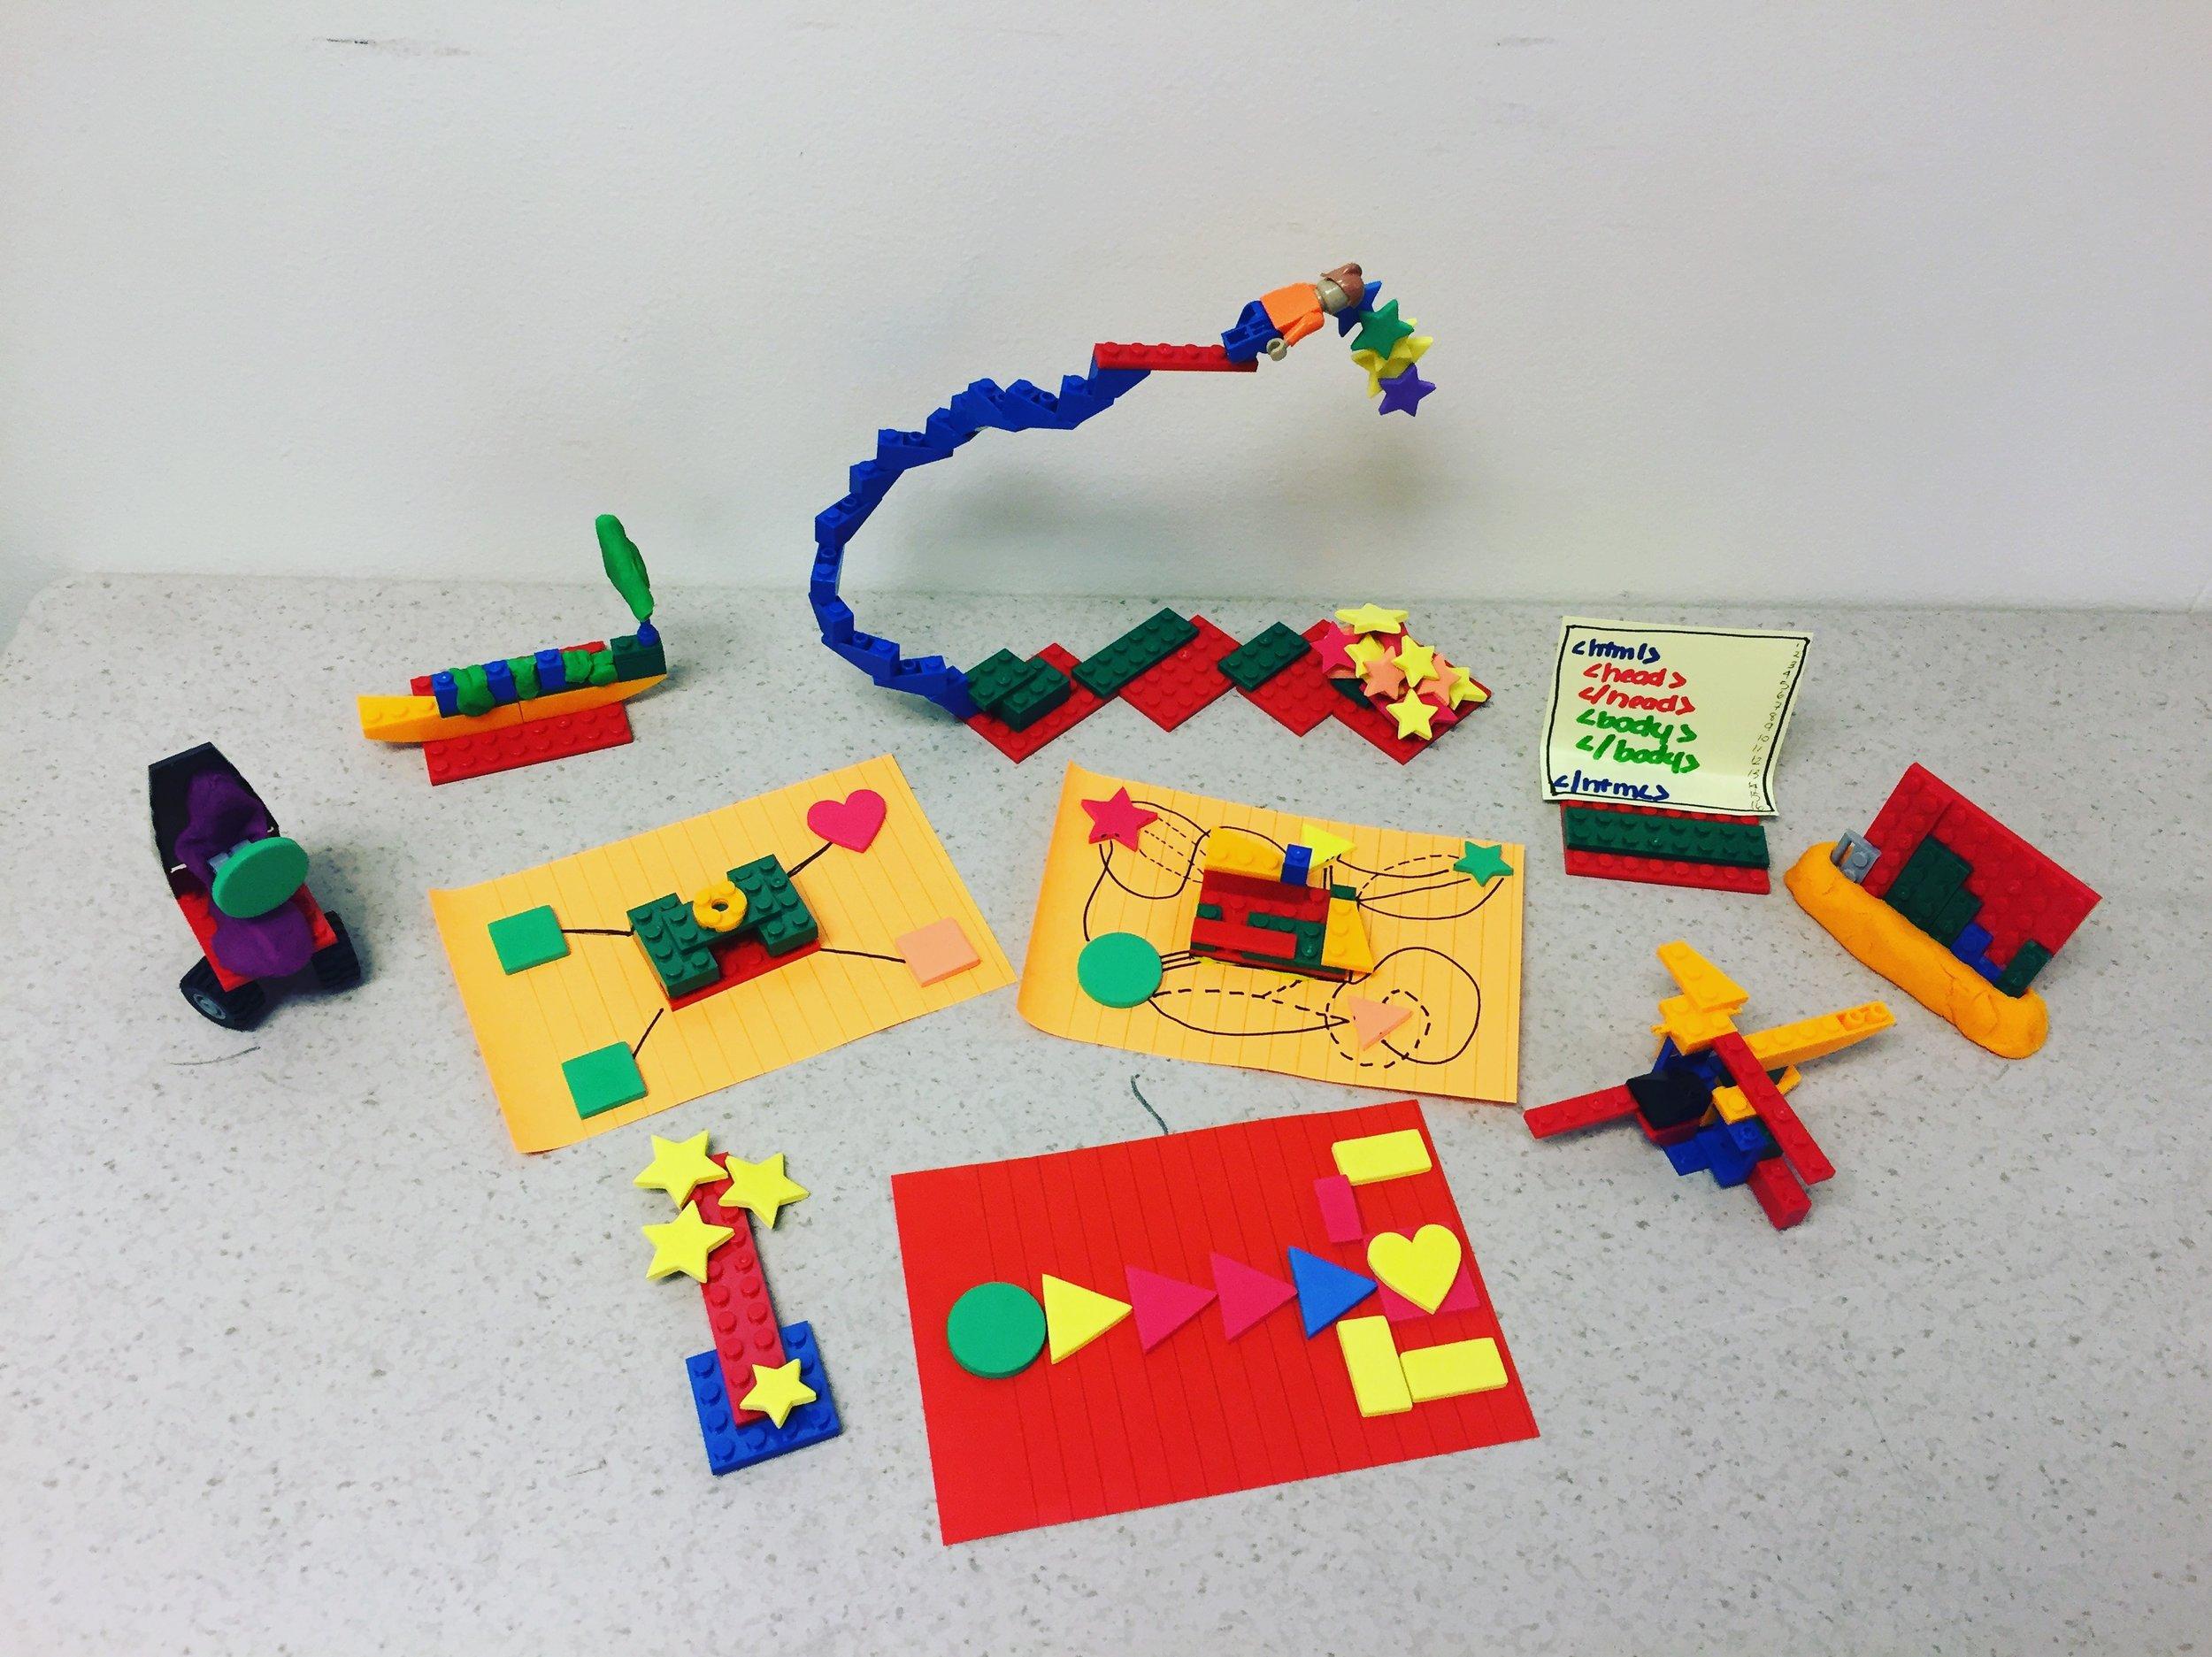 NYC Dept. of Education: Design Workshop Artifacts